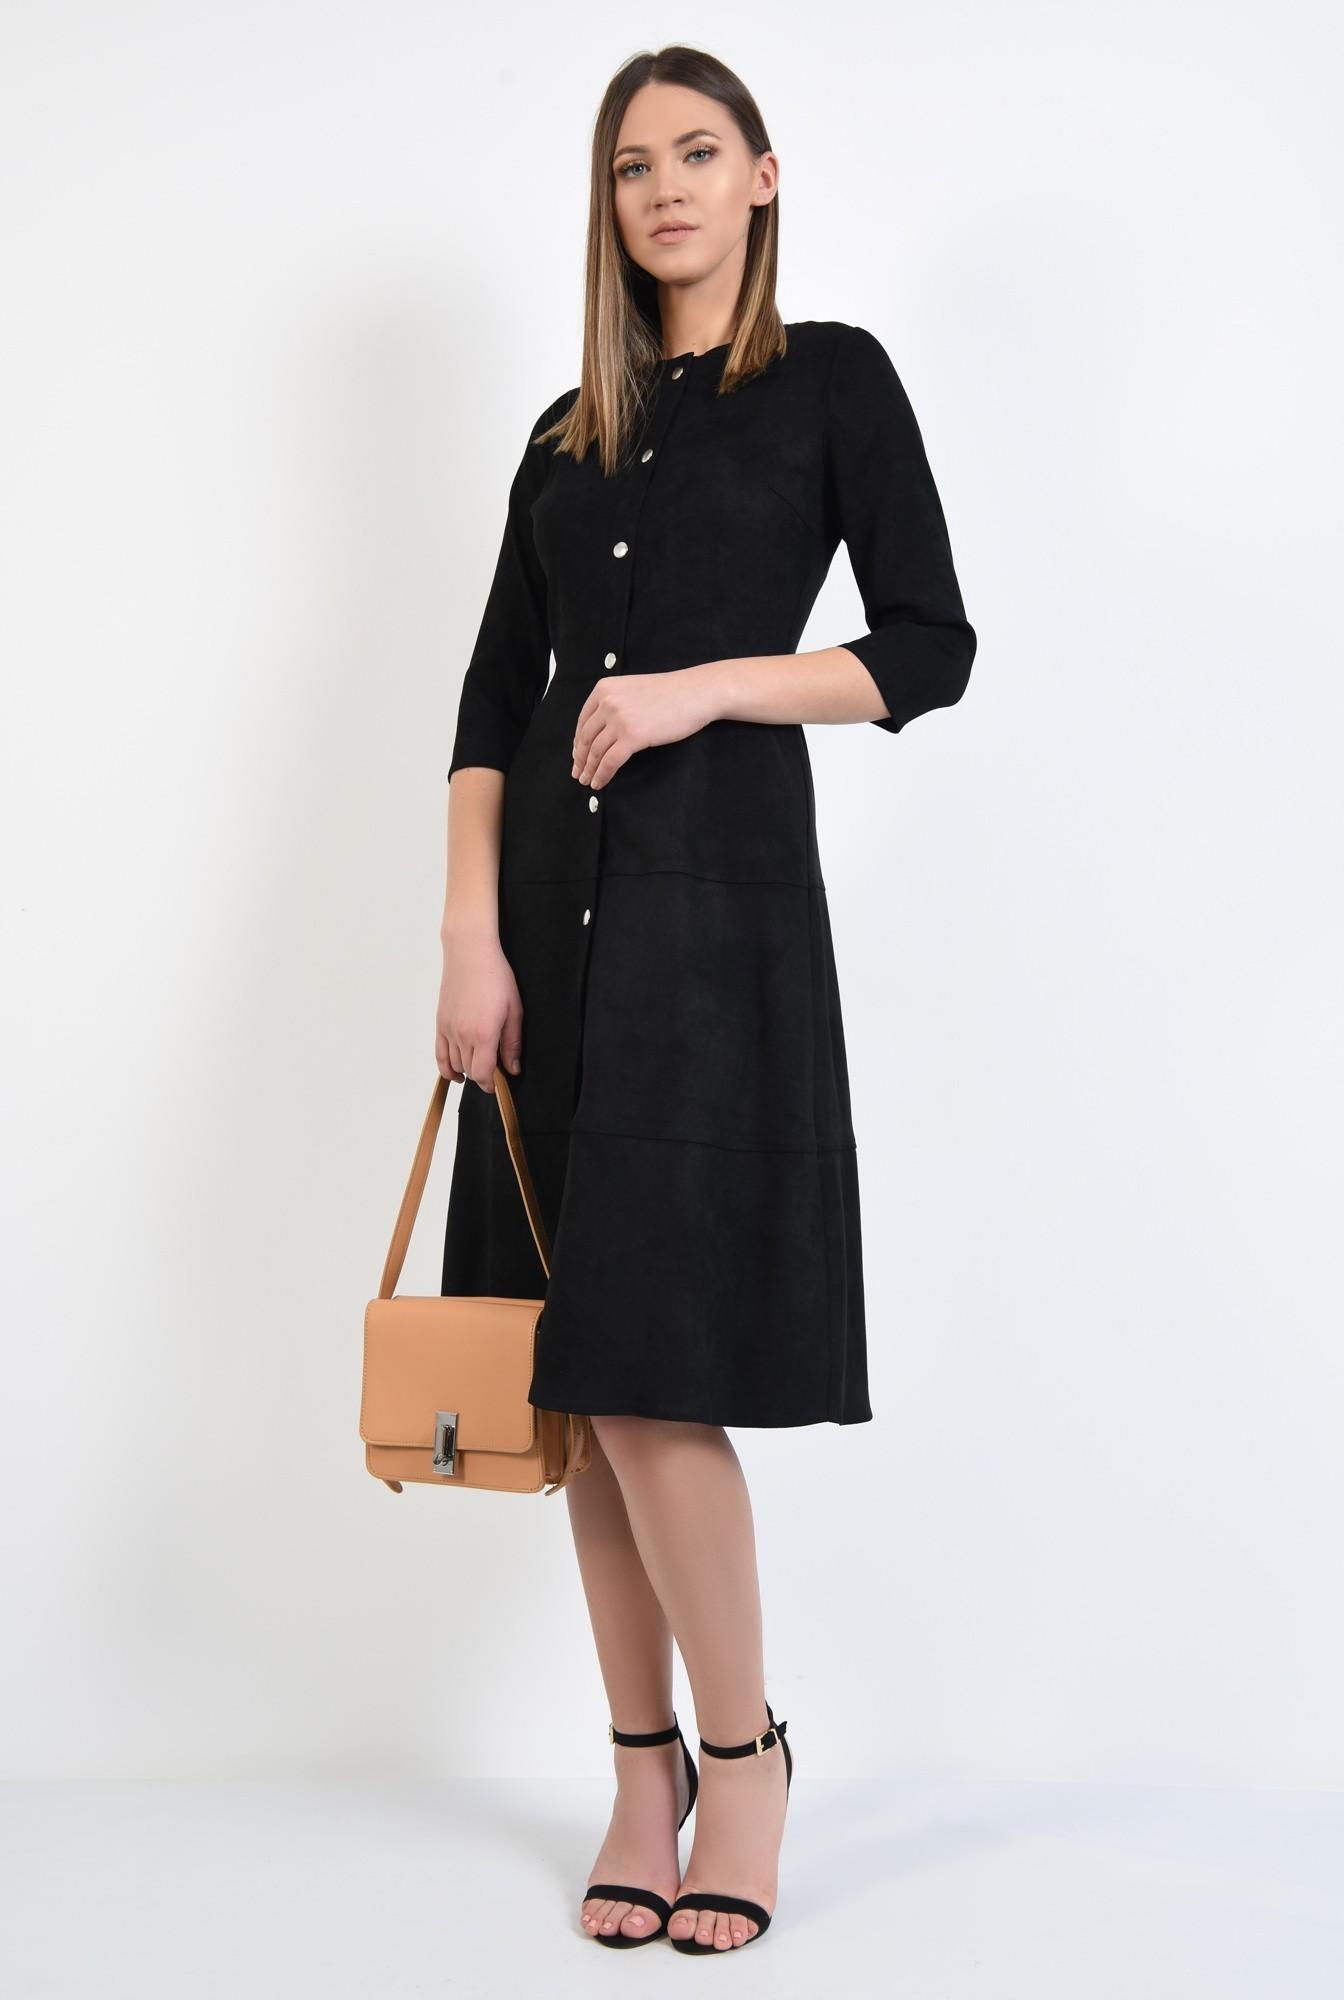 3 - rochie neagra, midi, evazata, din piele intoarsa ecologica